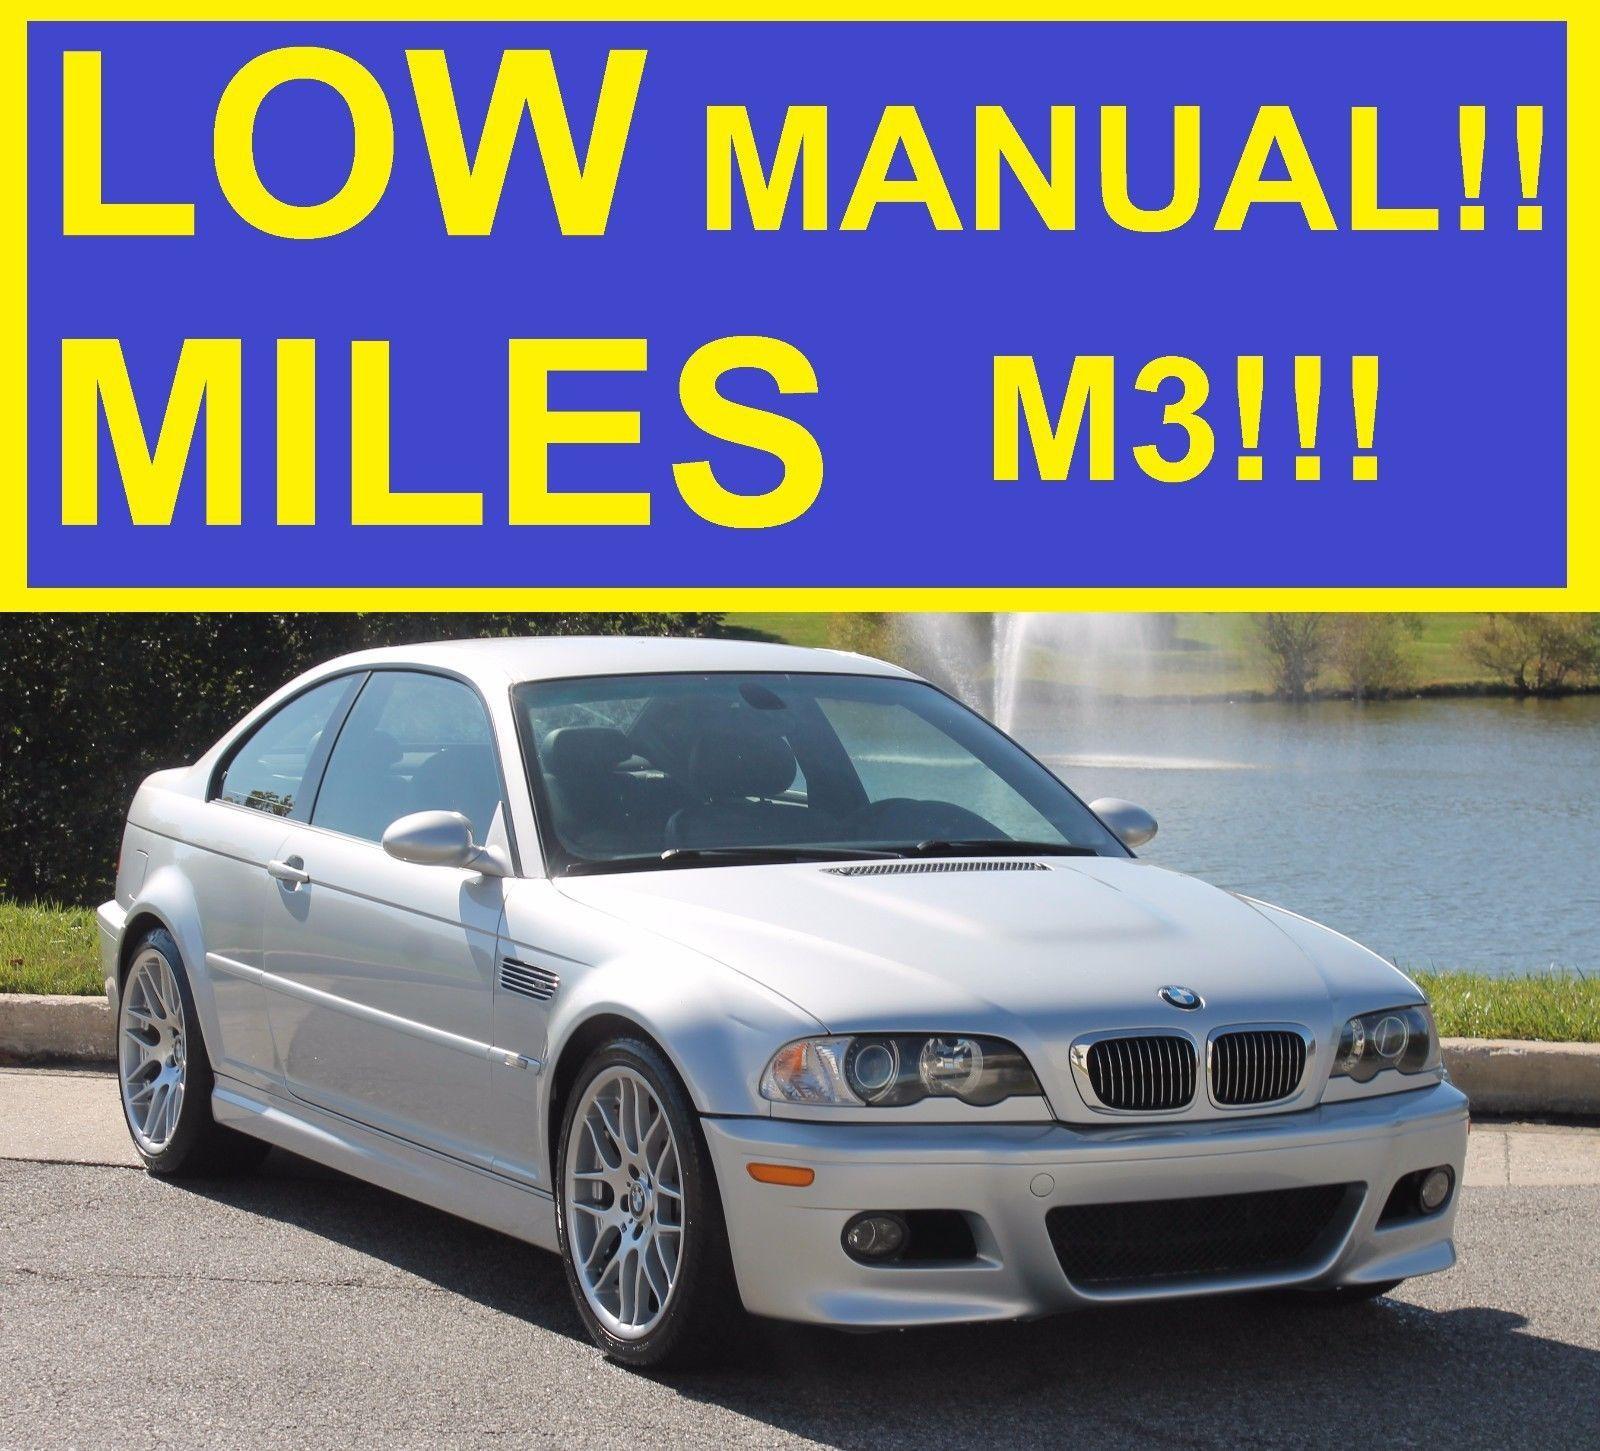 Awesome Amazing 2005 Bmw M3 M3 2005 Bmw M3 Manual 3 Series Super Clean 5 Series E46 330ci Convertible 04 03 06 2017 2018 Bmw Bmw Series Bmw Car